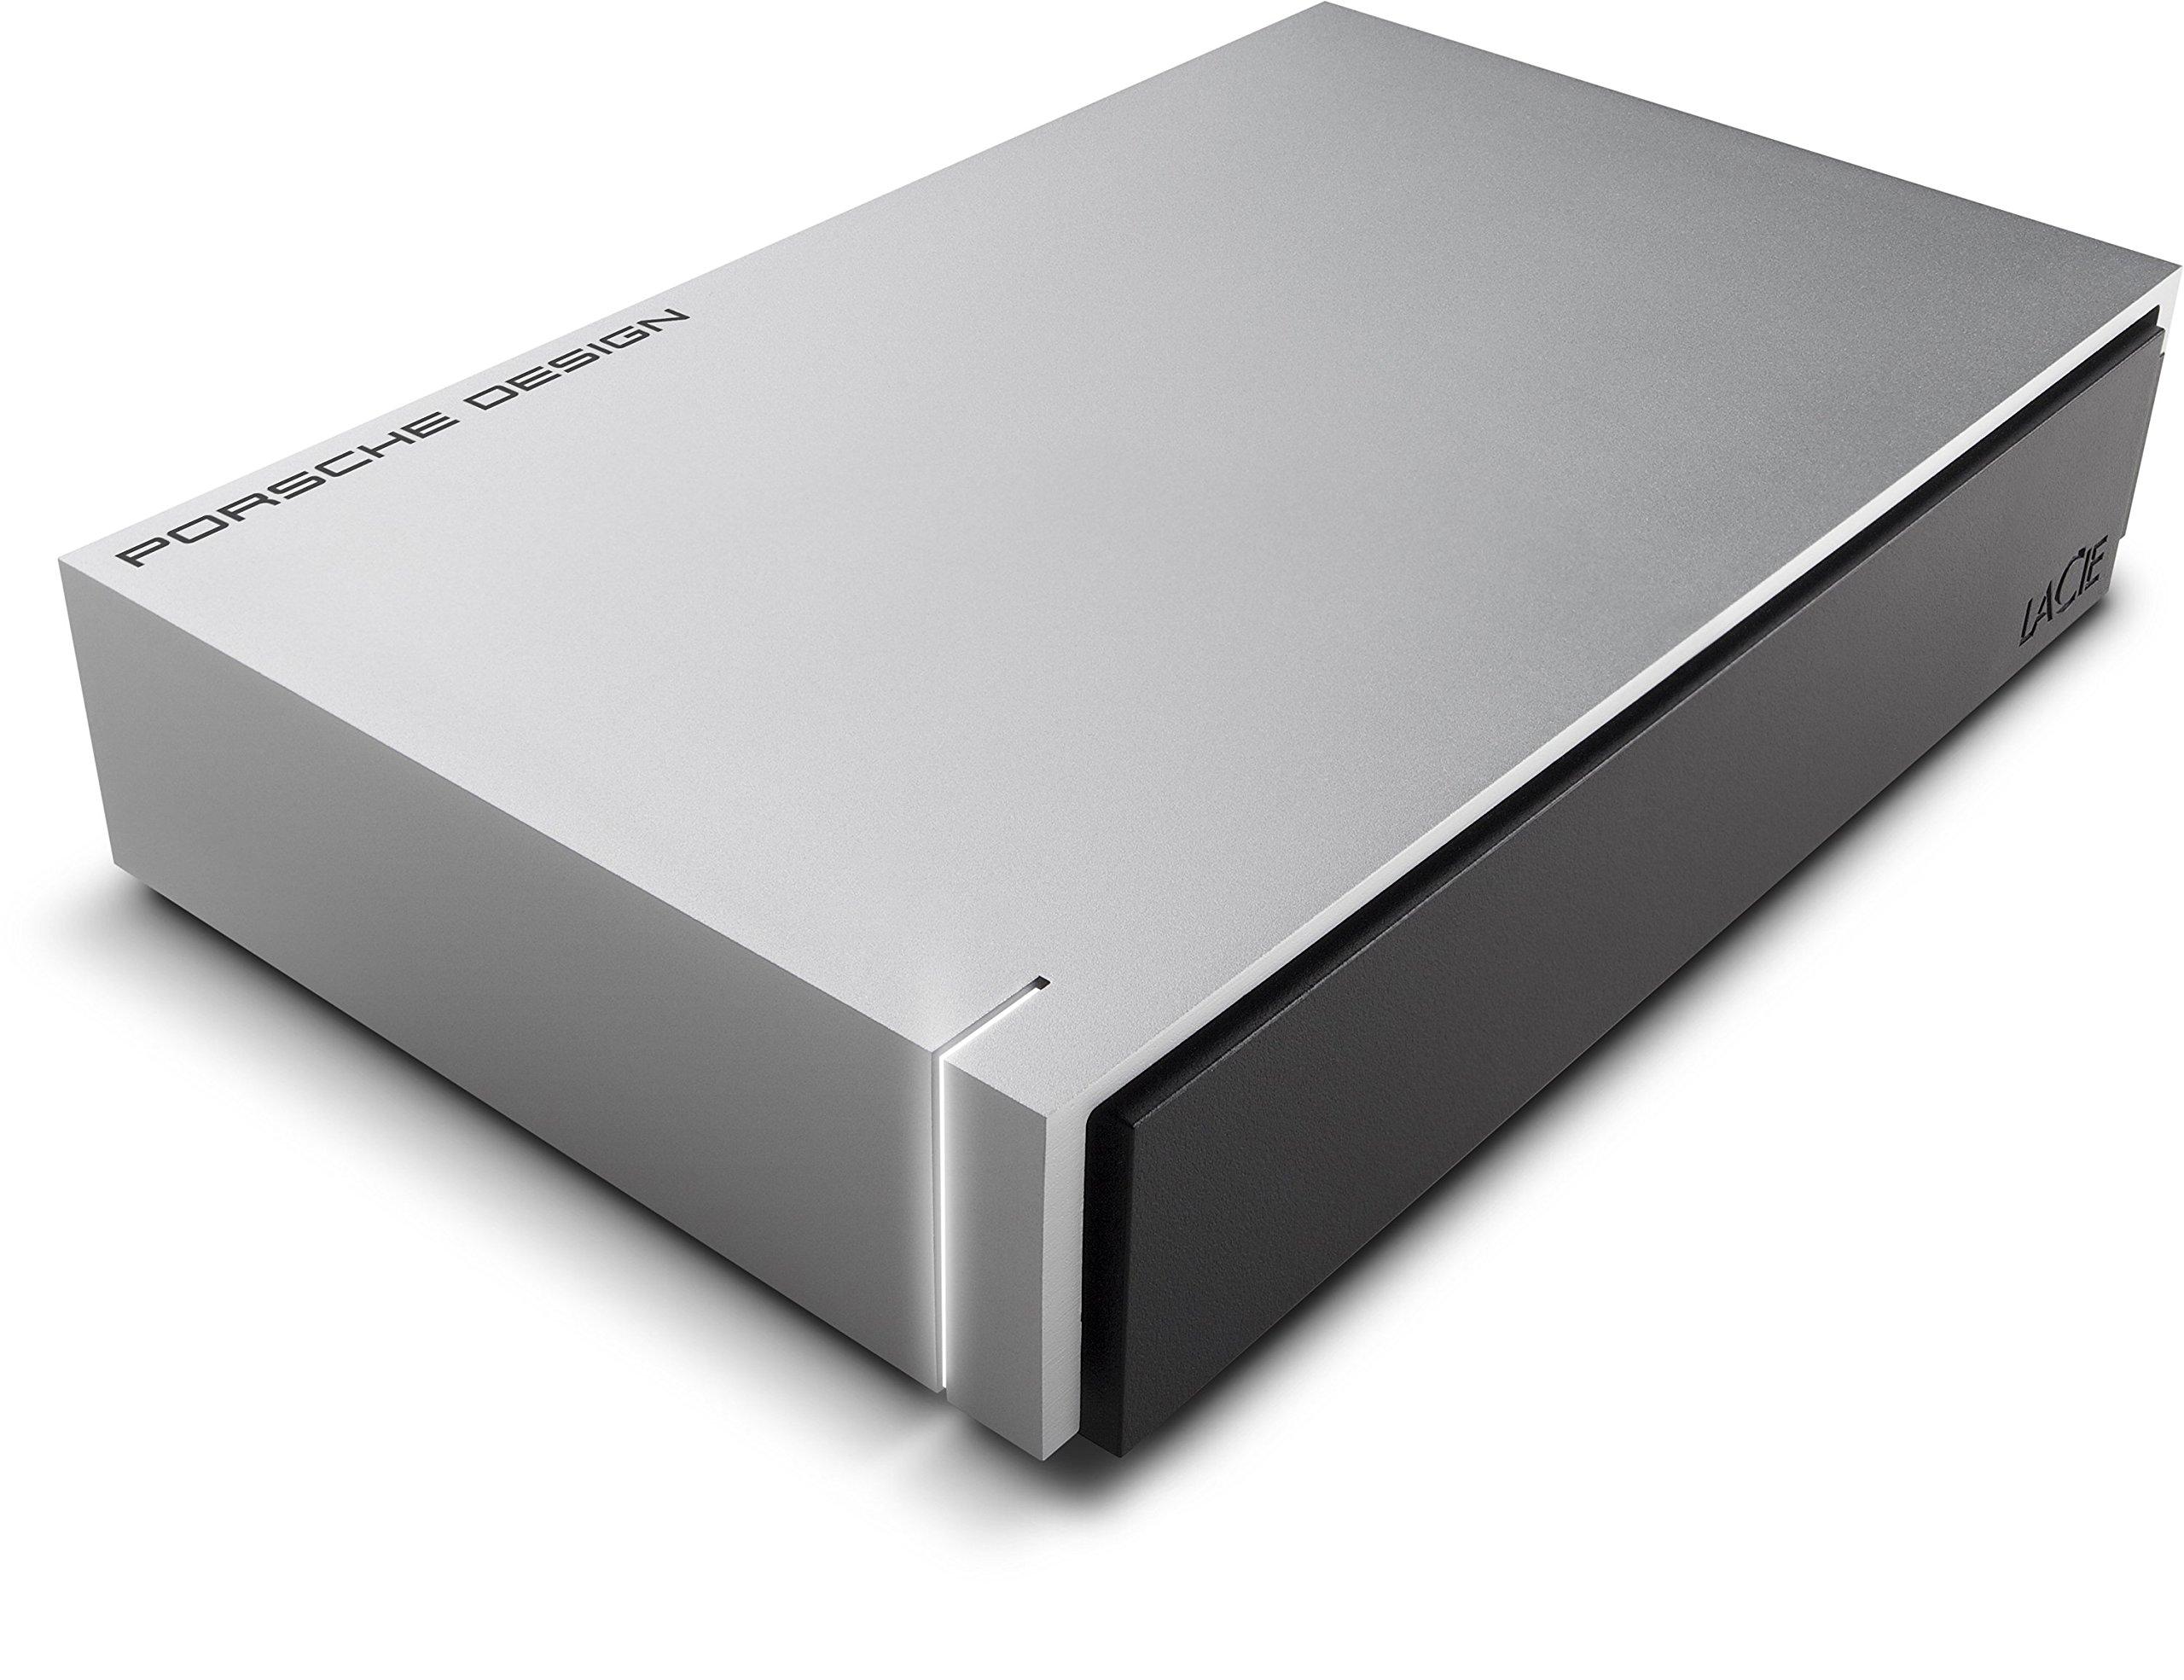 LaCie Porsche Design 4TB USB 3.0 Desktop Hard Drive + 2mo Adobe CC Photography (STEW4000400)